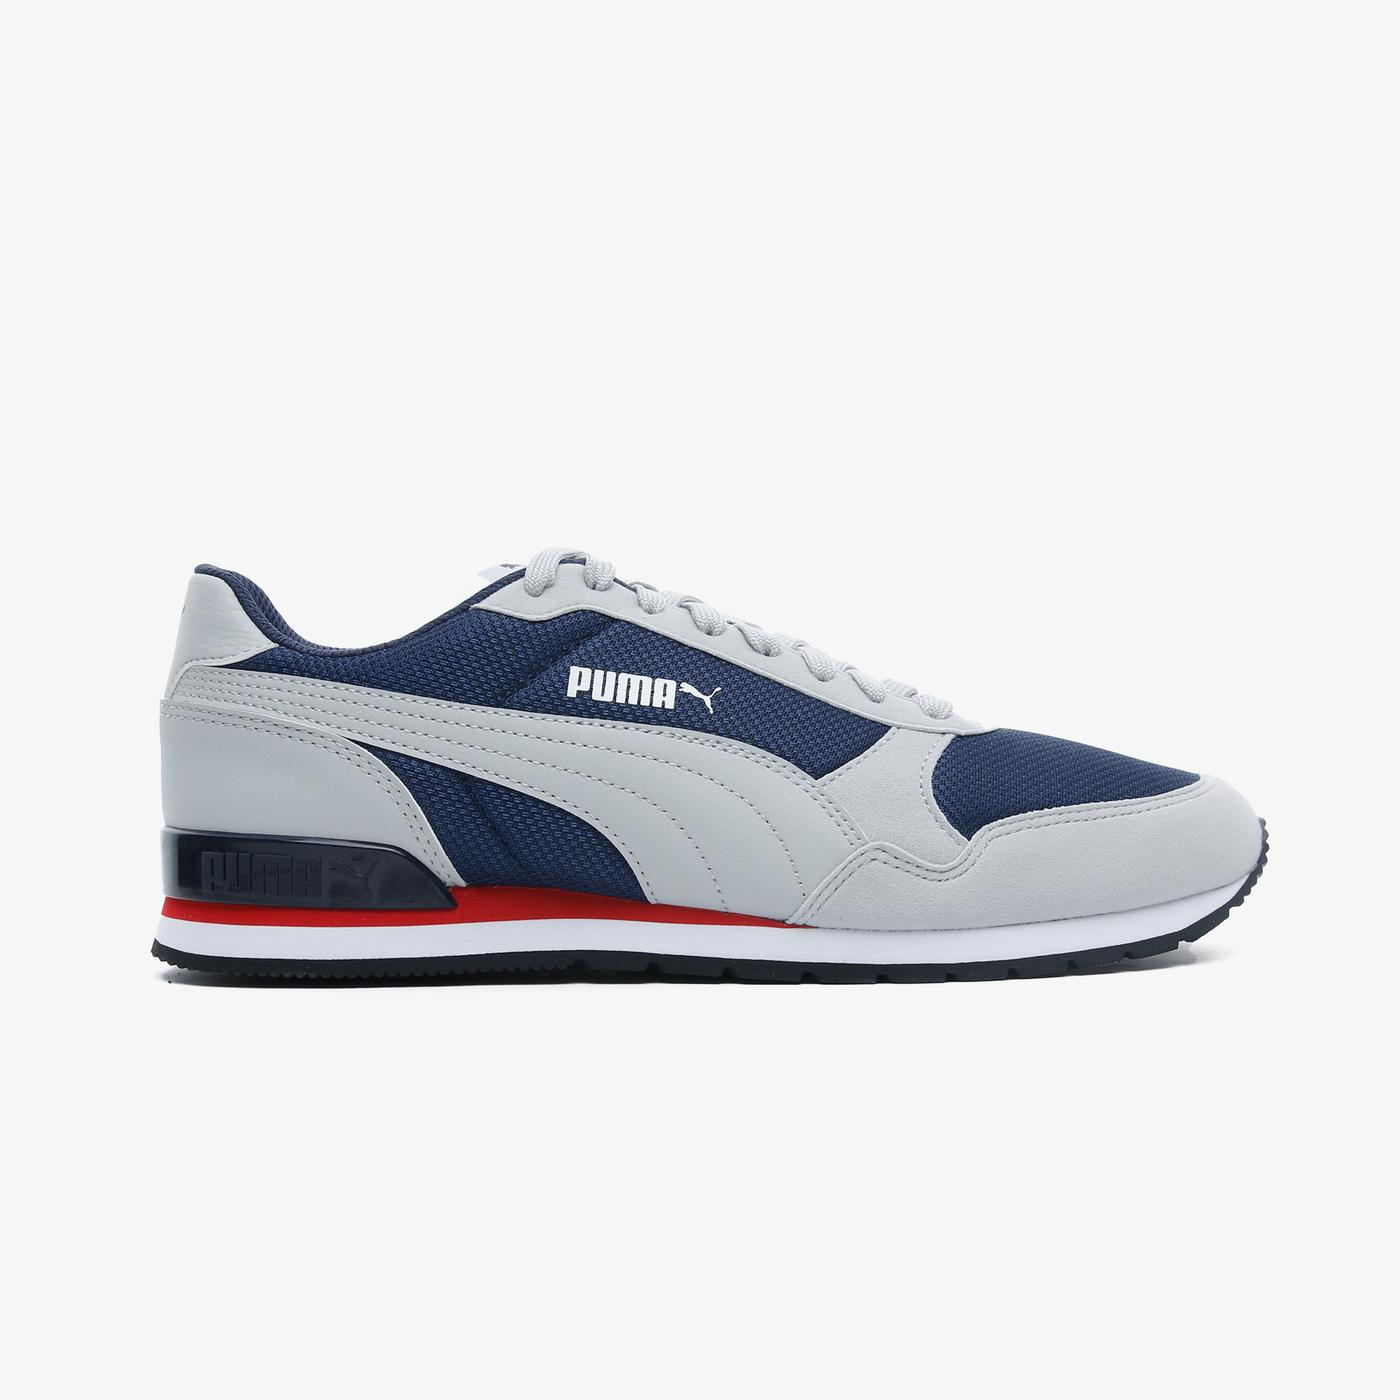 Puma ST Runner v2 Erkek Lacivert Spor Ayakkabı